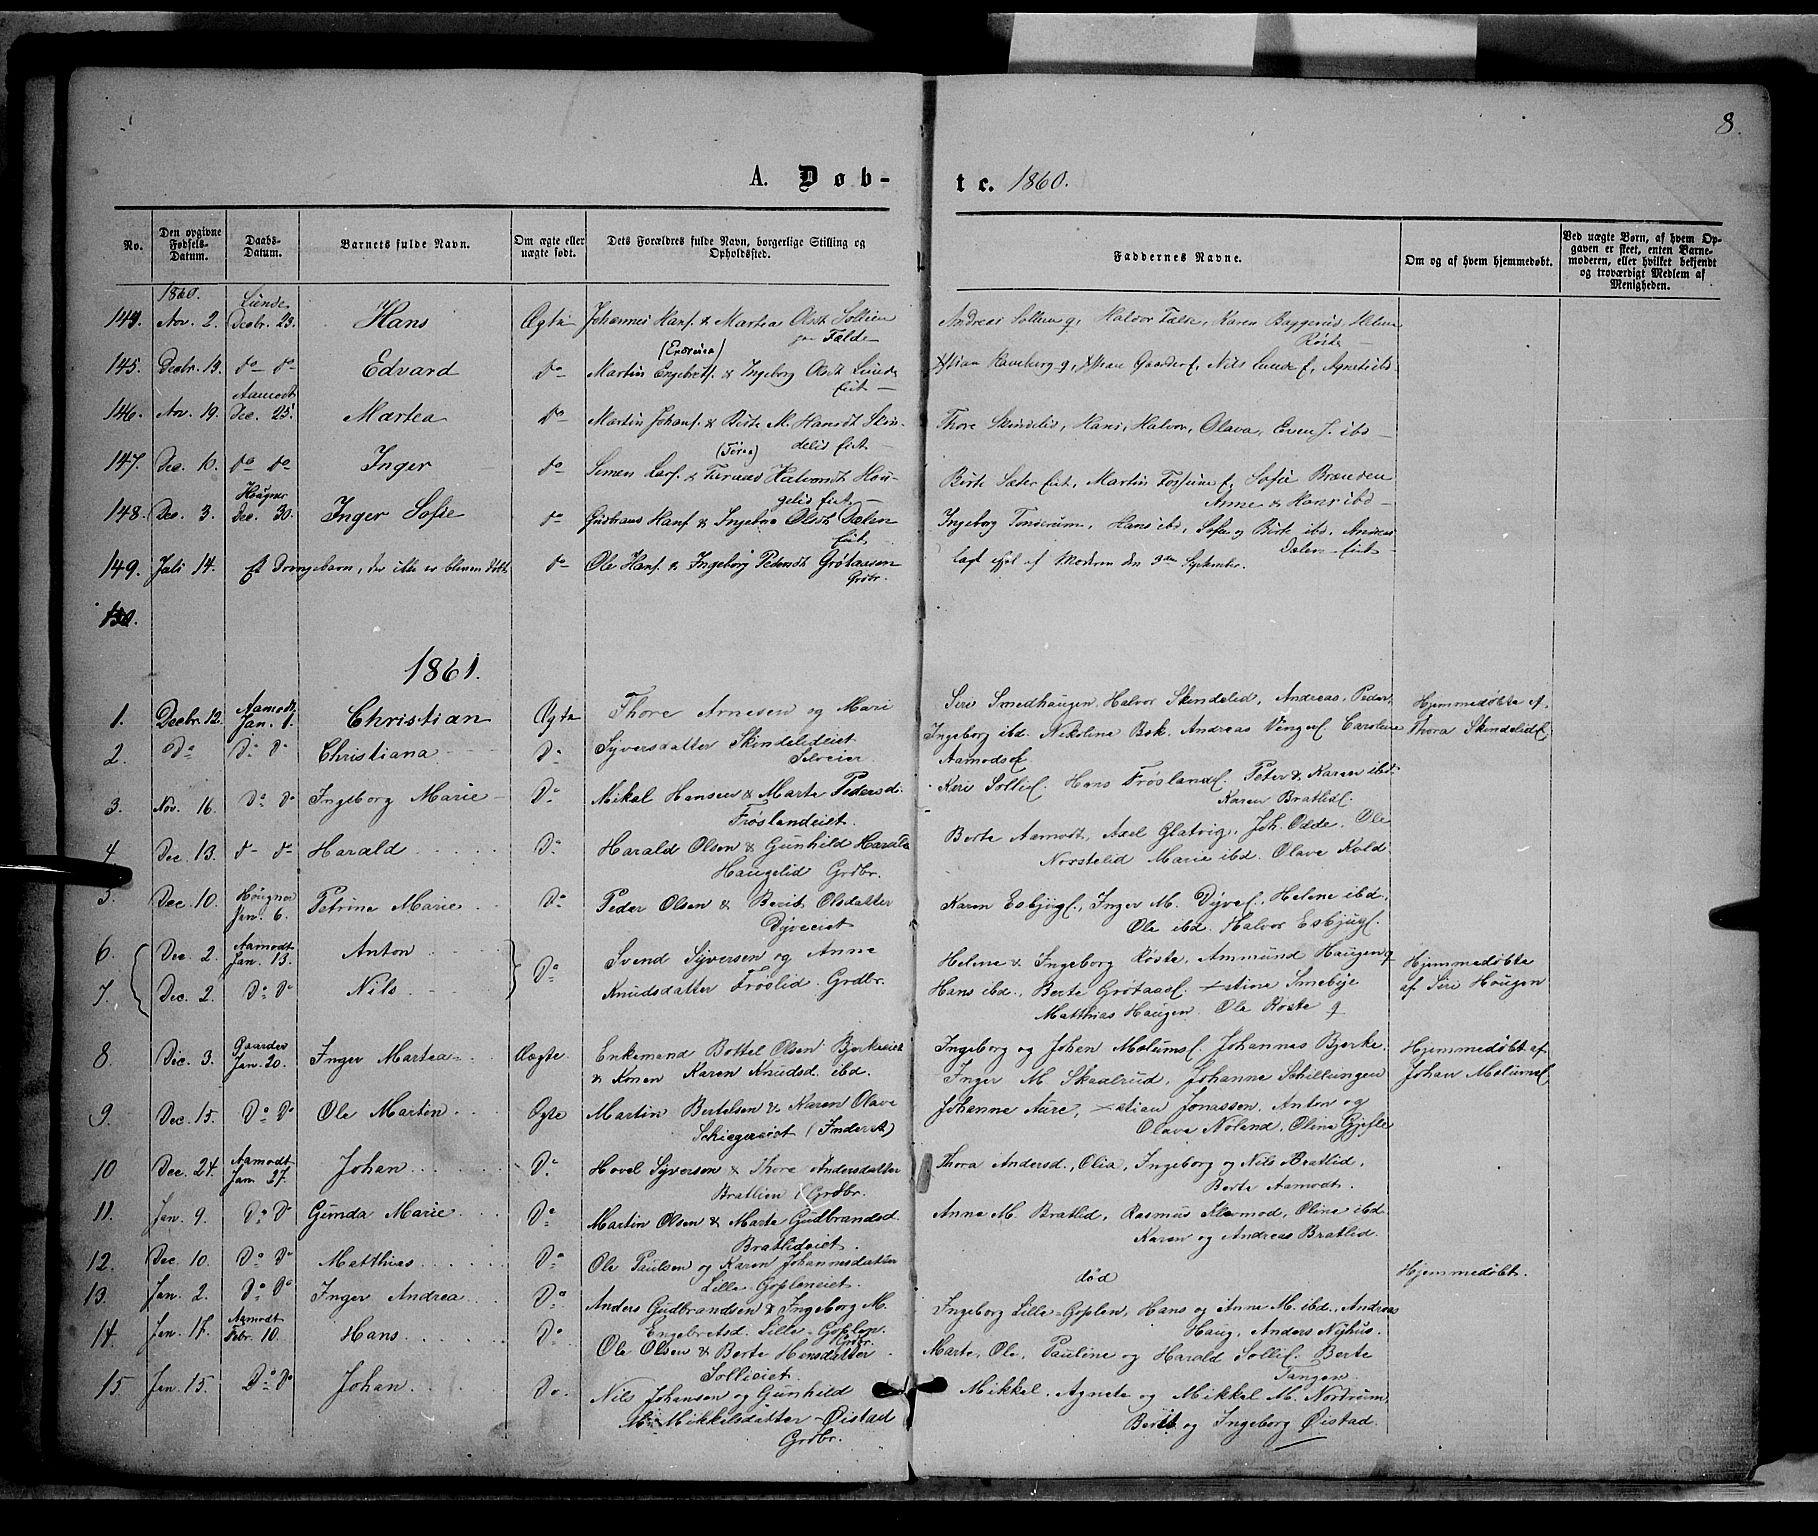 SAH, Nordre Land prestekontor, Ministerialbok nr. 1, 1860-1871, s. 8